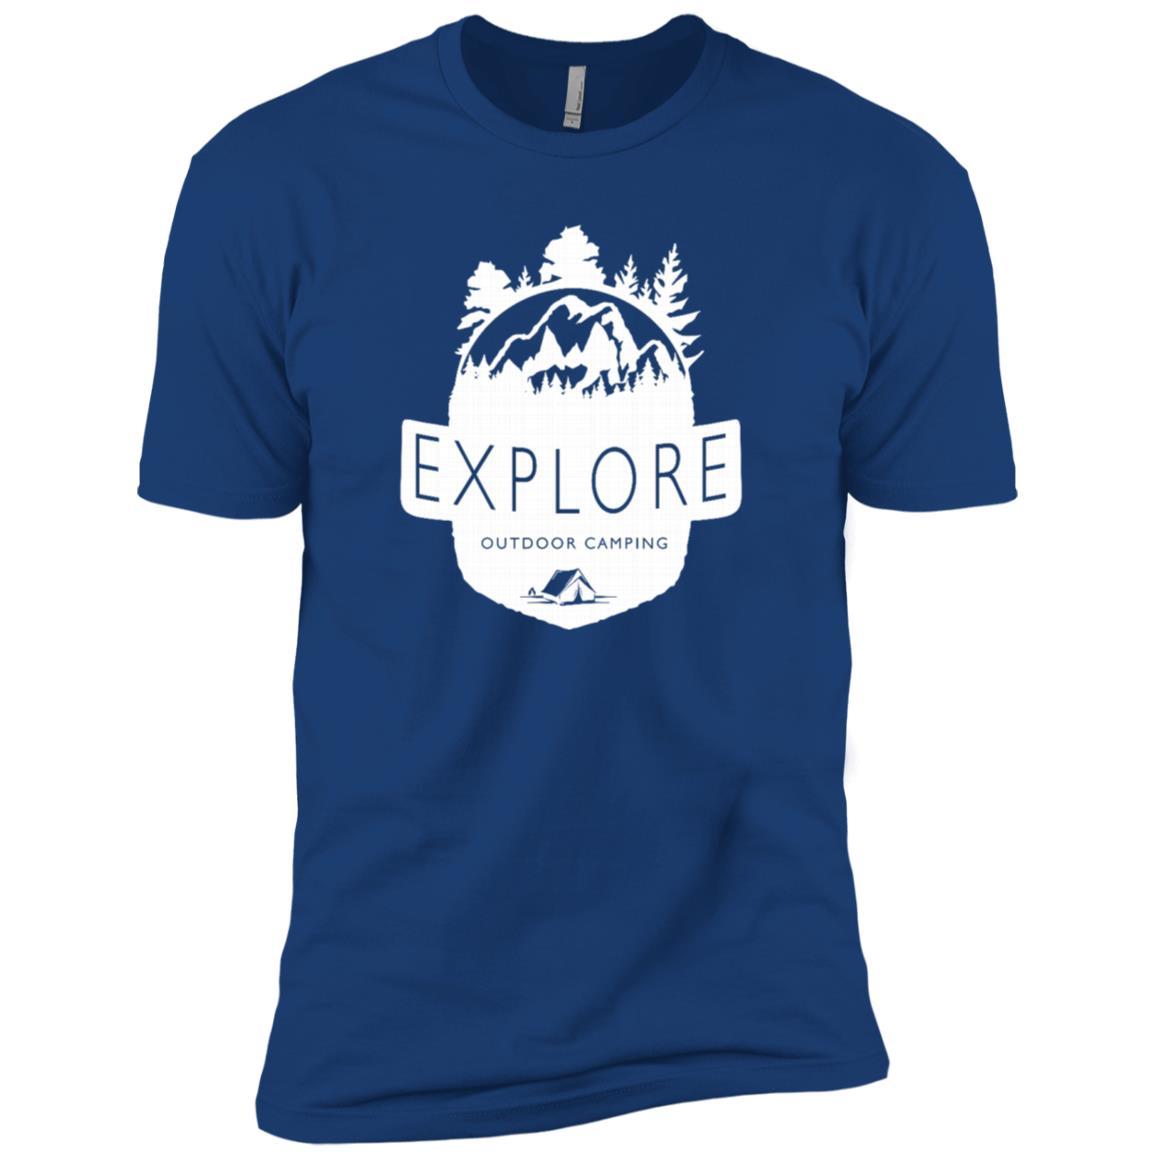 Explore Outdoor Camping – Hunting Outdoor Men Short Sleeve T-Shirt